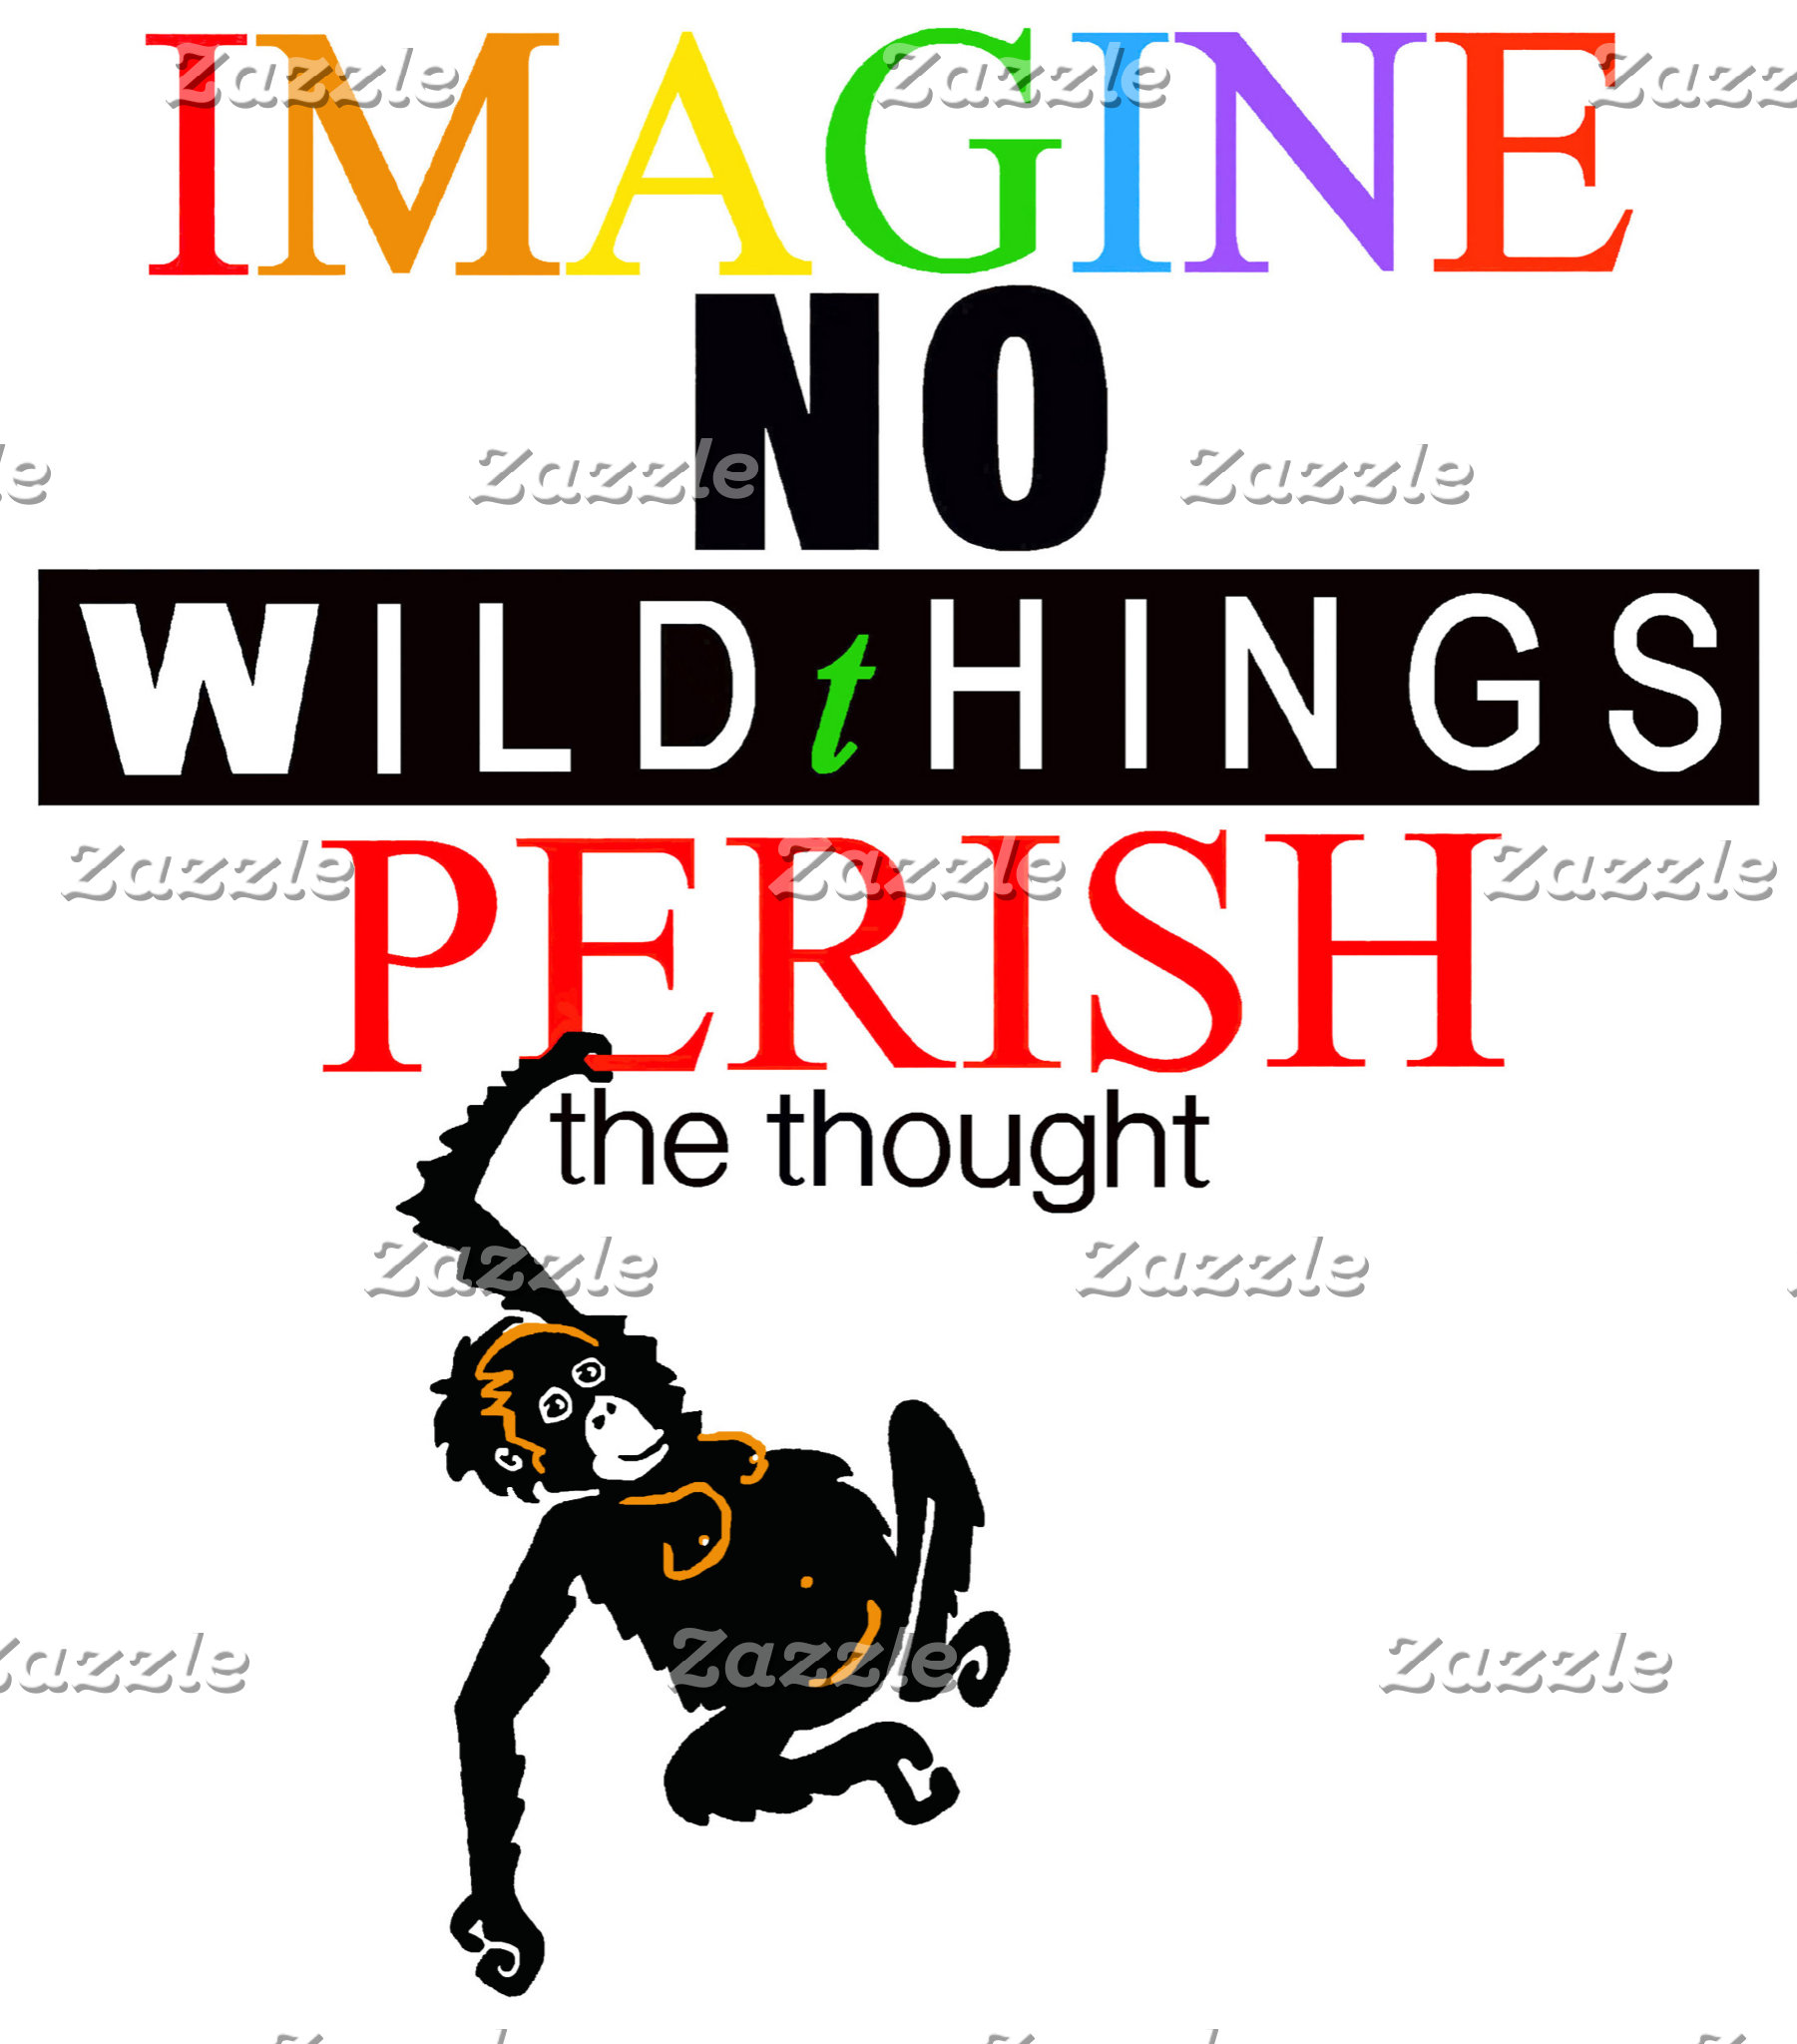 IMAGINE no wildthings